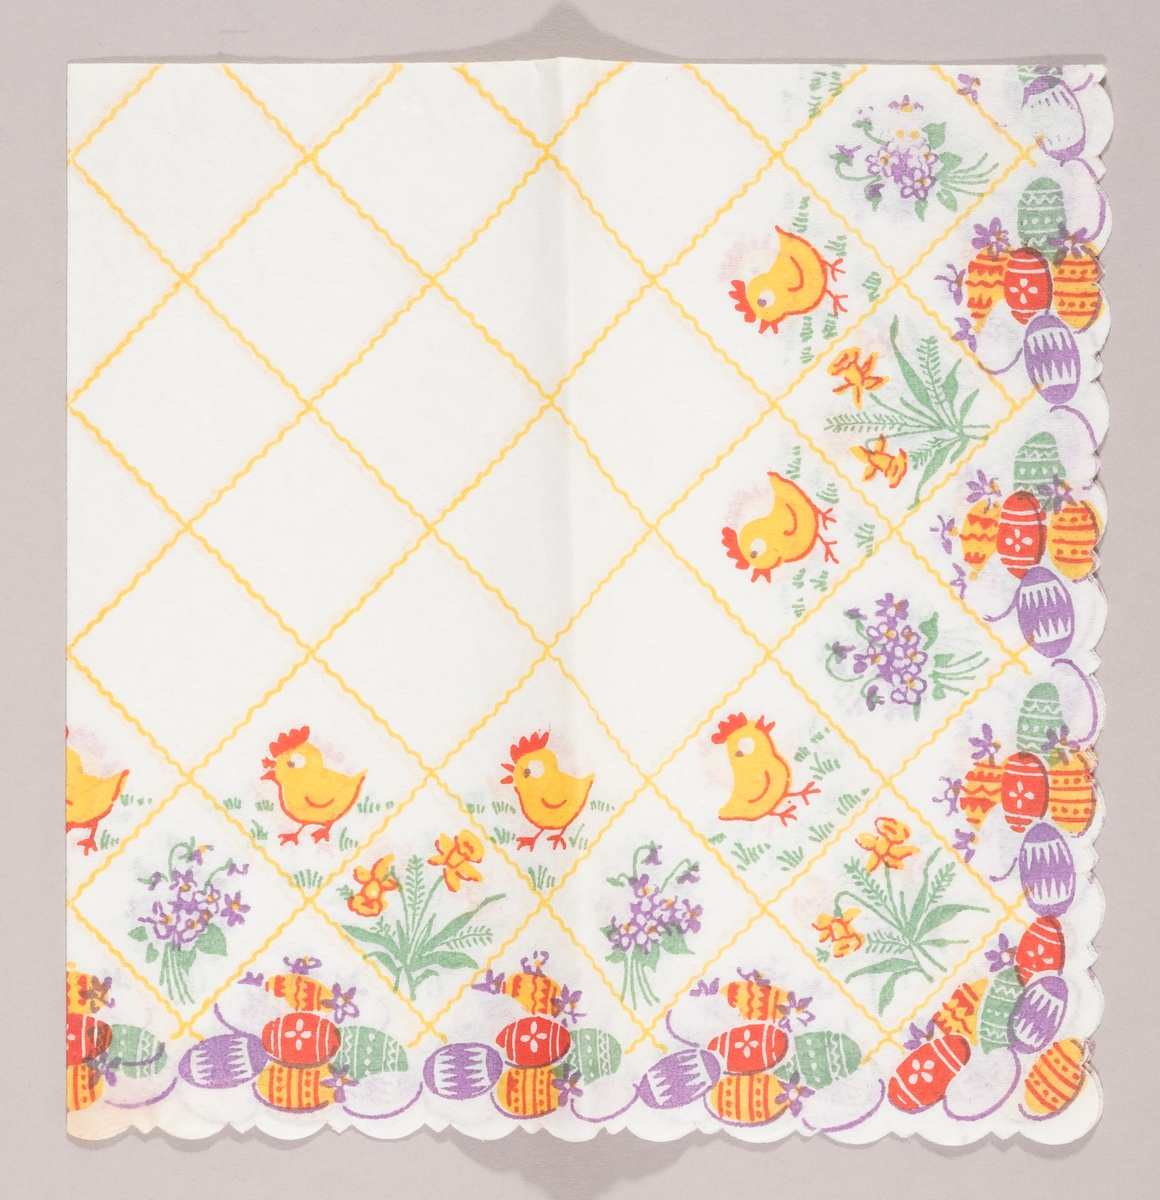 Skrårutete gult mønster. Kyllinger, lilla blomsterbuketter, påskeegg i mange farger.